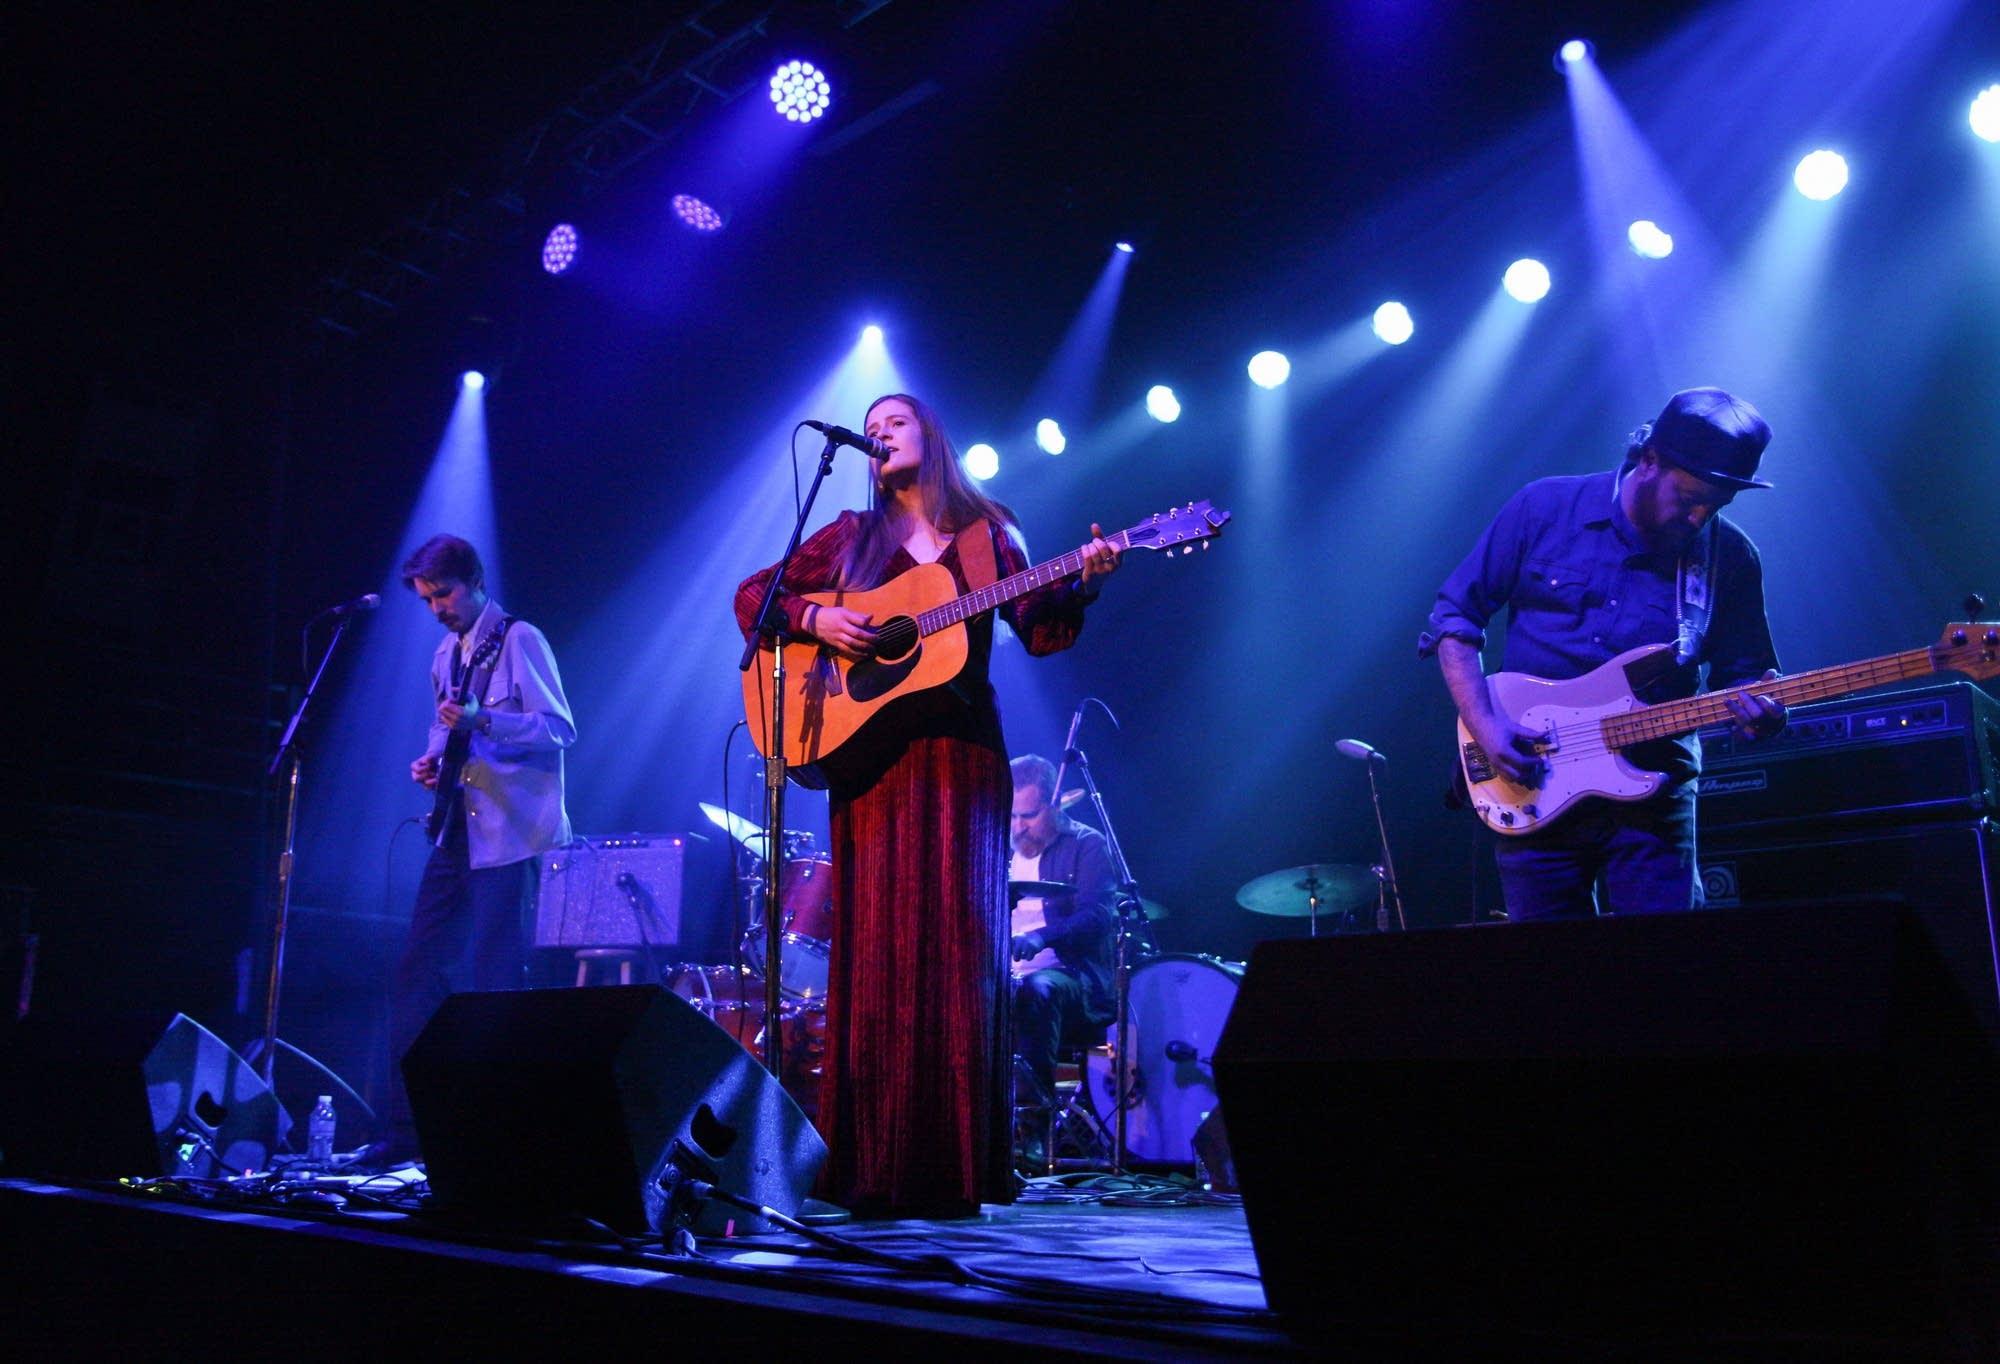 Kacy & Clayton perform at United States of Americana's 8th birthday